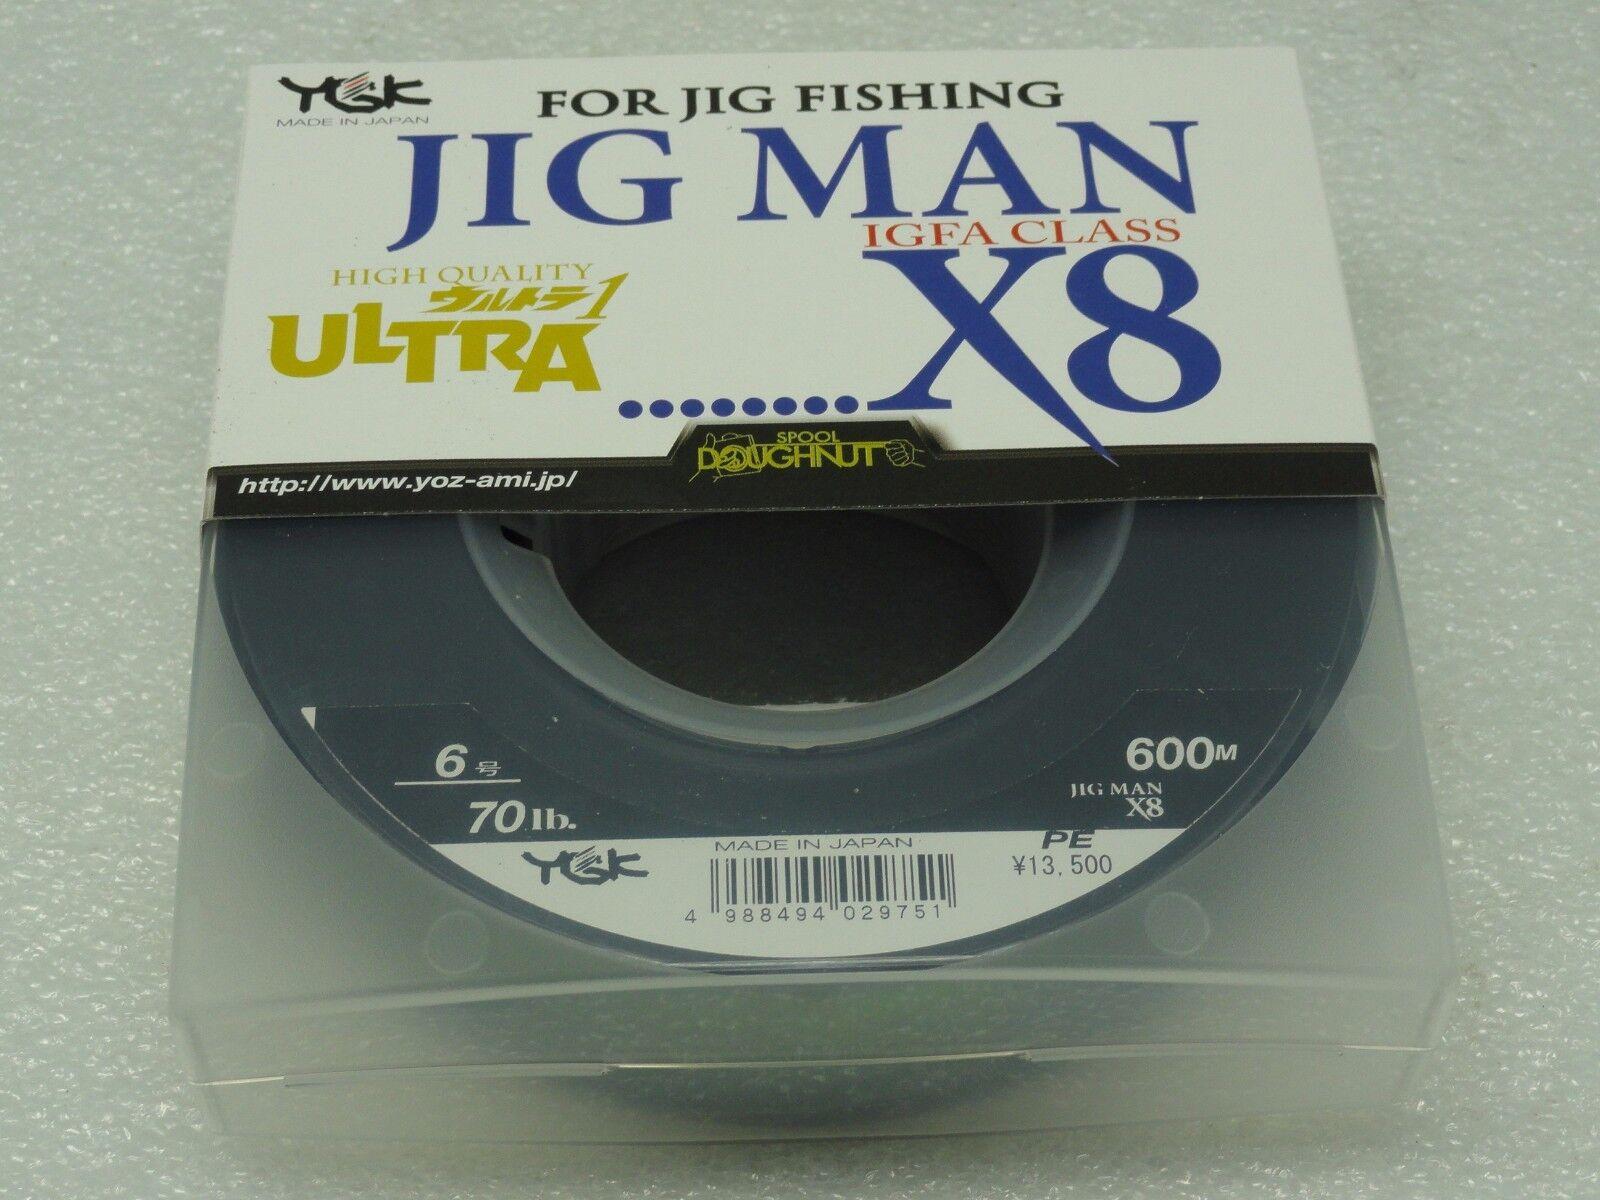 YGK JIG MAN IGFA CLASS X8 8 Braided PE 6 line SPECTRA lb 600m Made in Japan